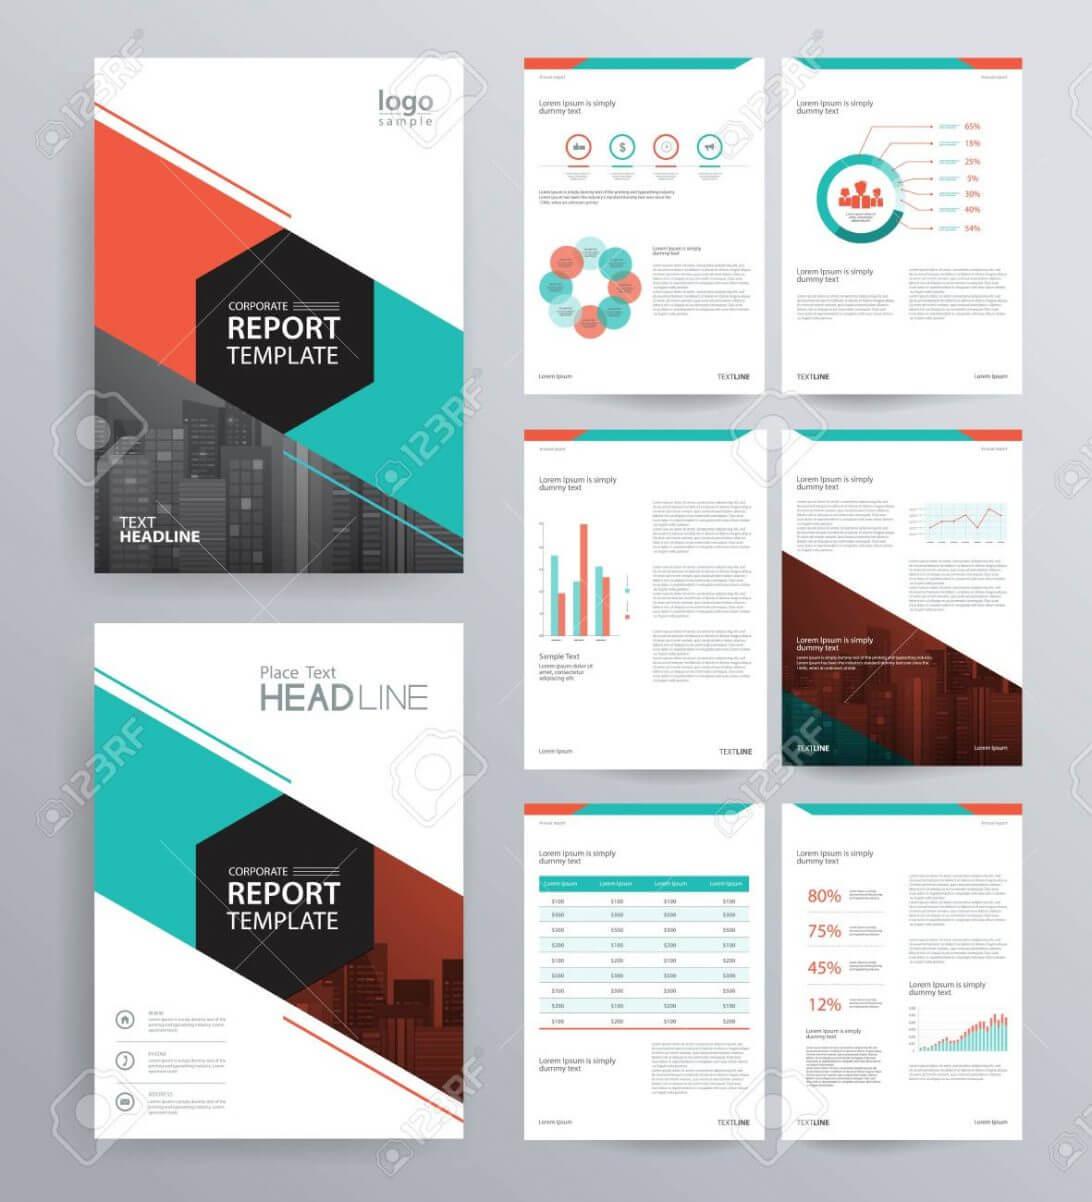 Annual Report Template Design For Company Profile Brochure In Hr Annual Report Template